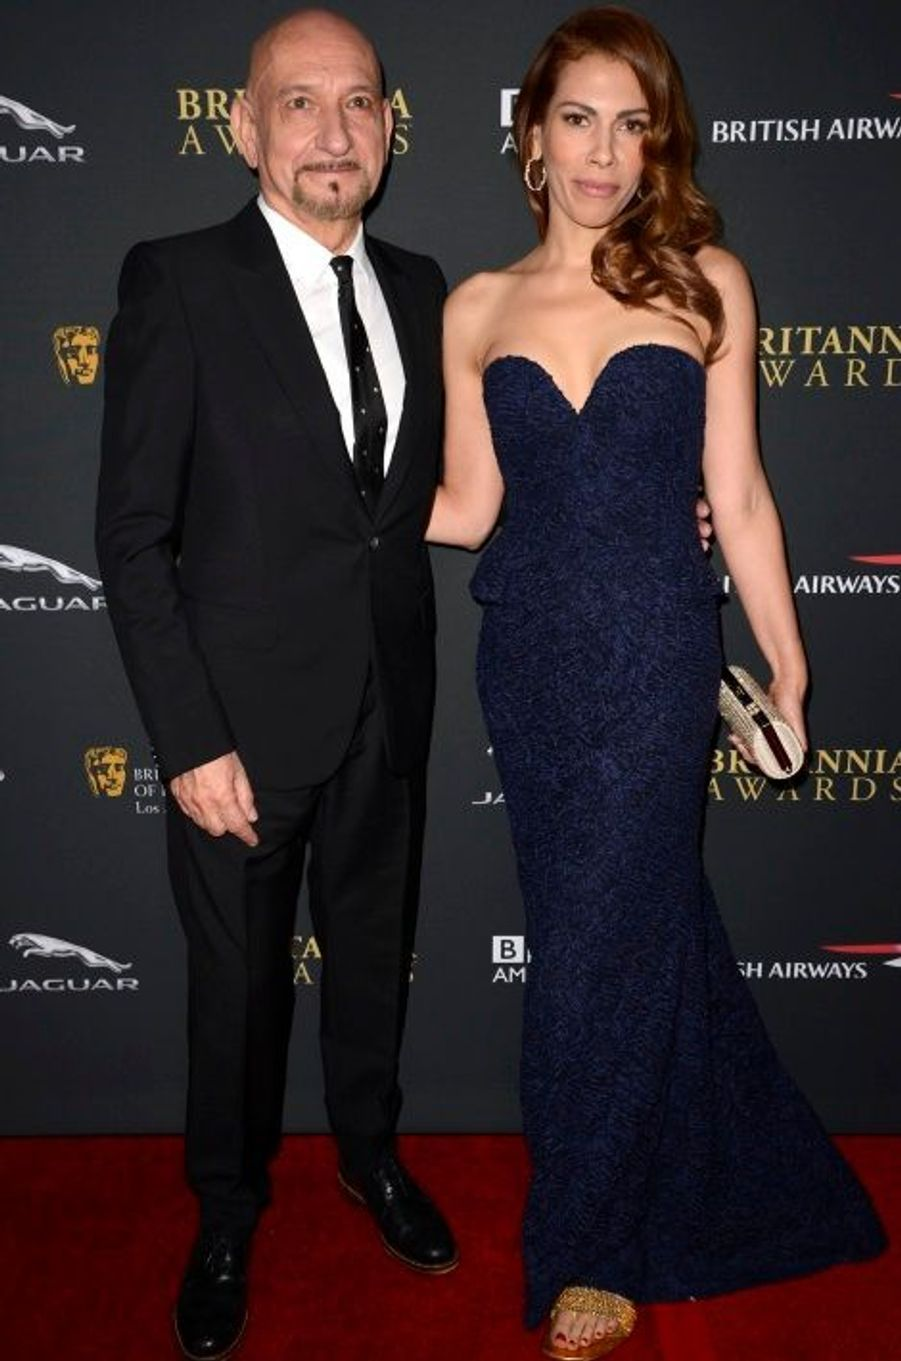 Ben Kingsley, honoré du Albert R. Broccoli Britannia Award for Worldwide Contribution to Entertainment